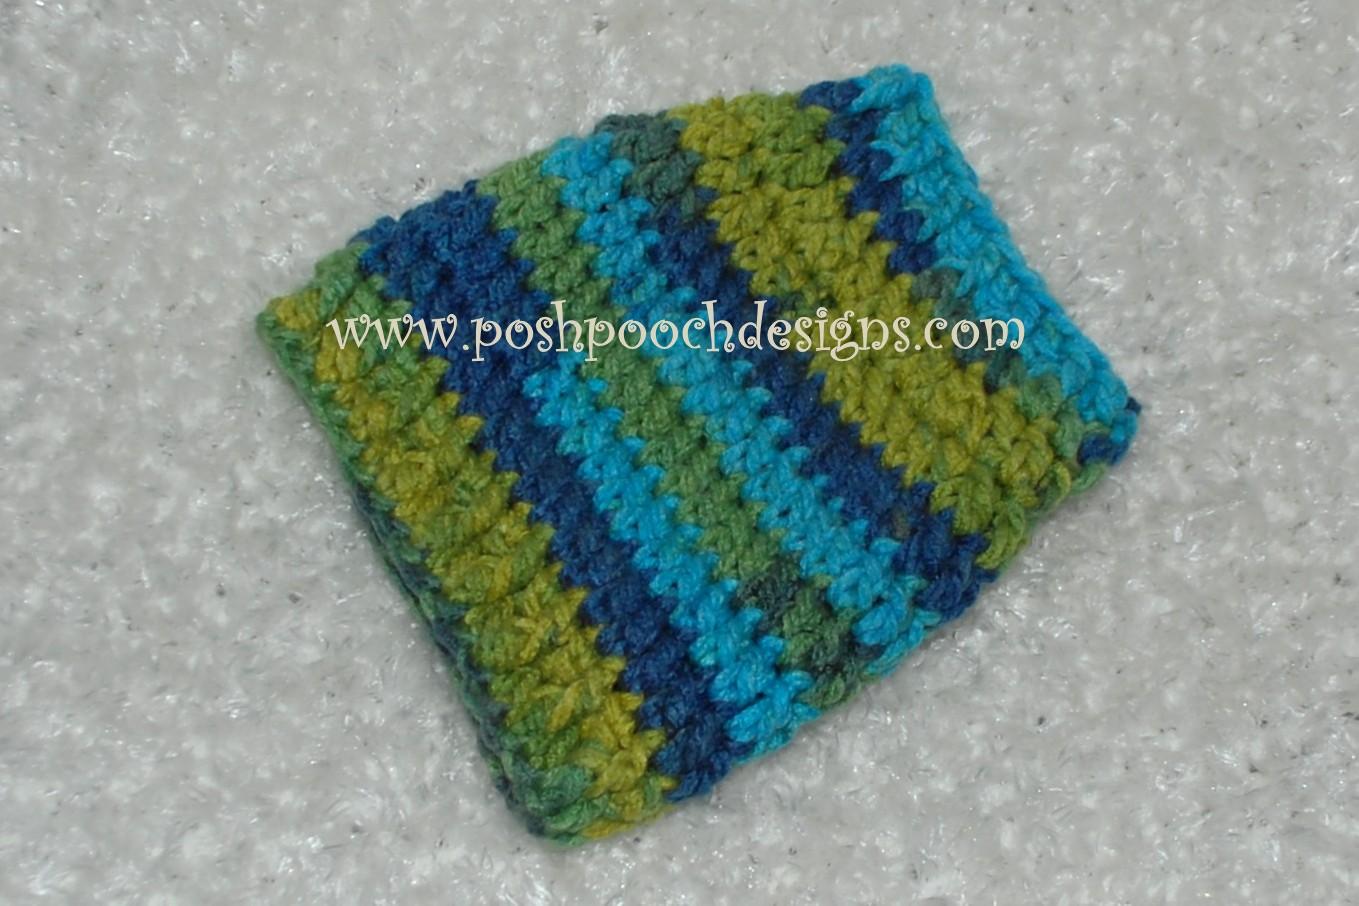 Free crochet pattern dog snood dancox for posh pooch designs dog clothes dog snood crochet pattern bankloansurffo Images